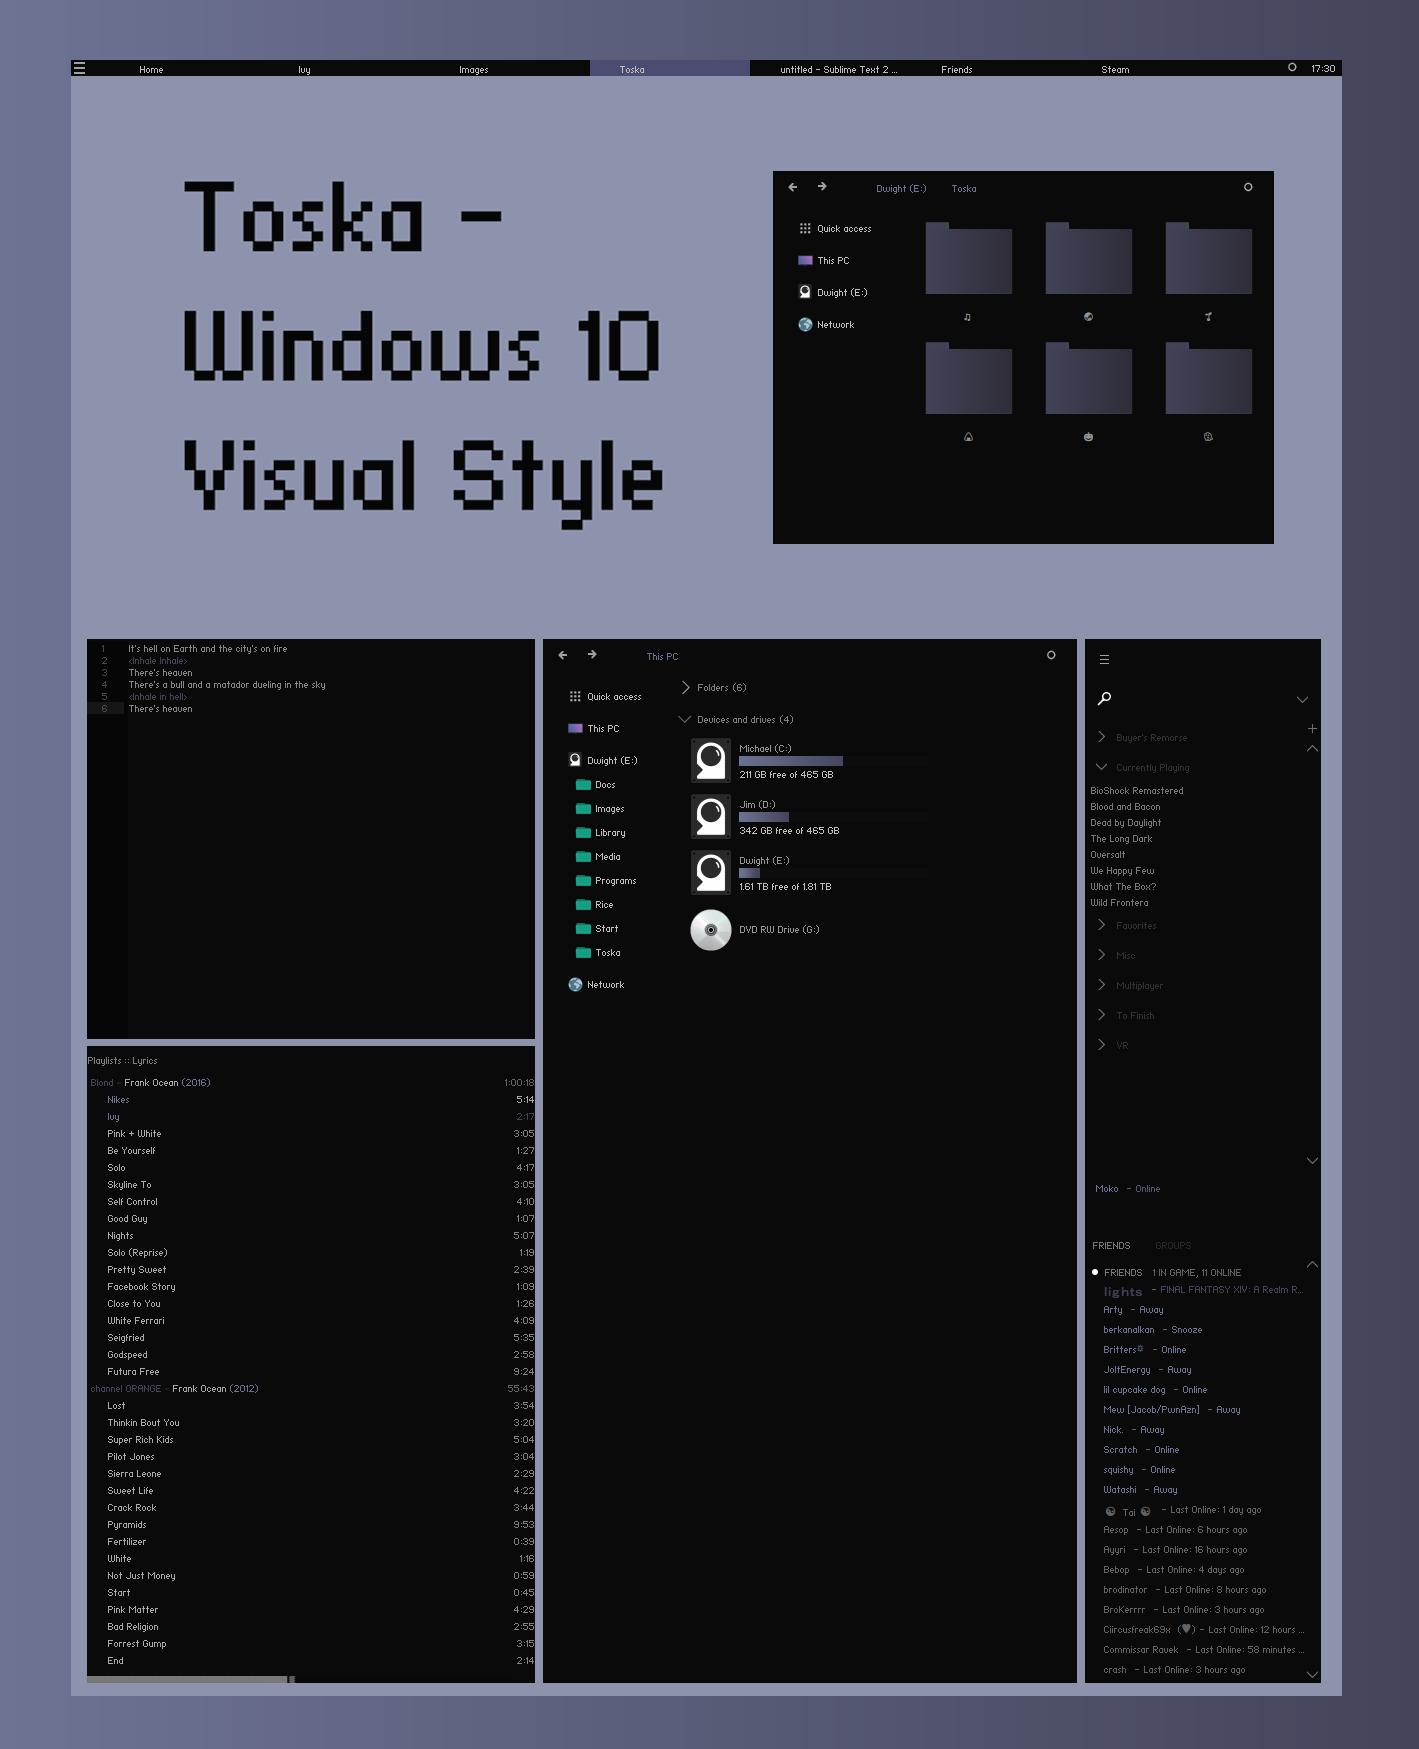 Toska W10